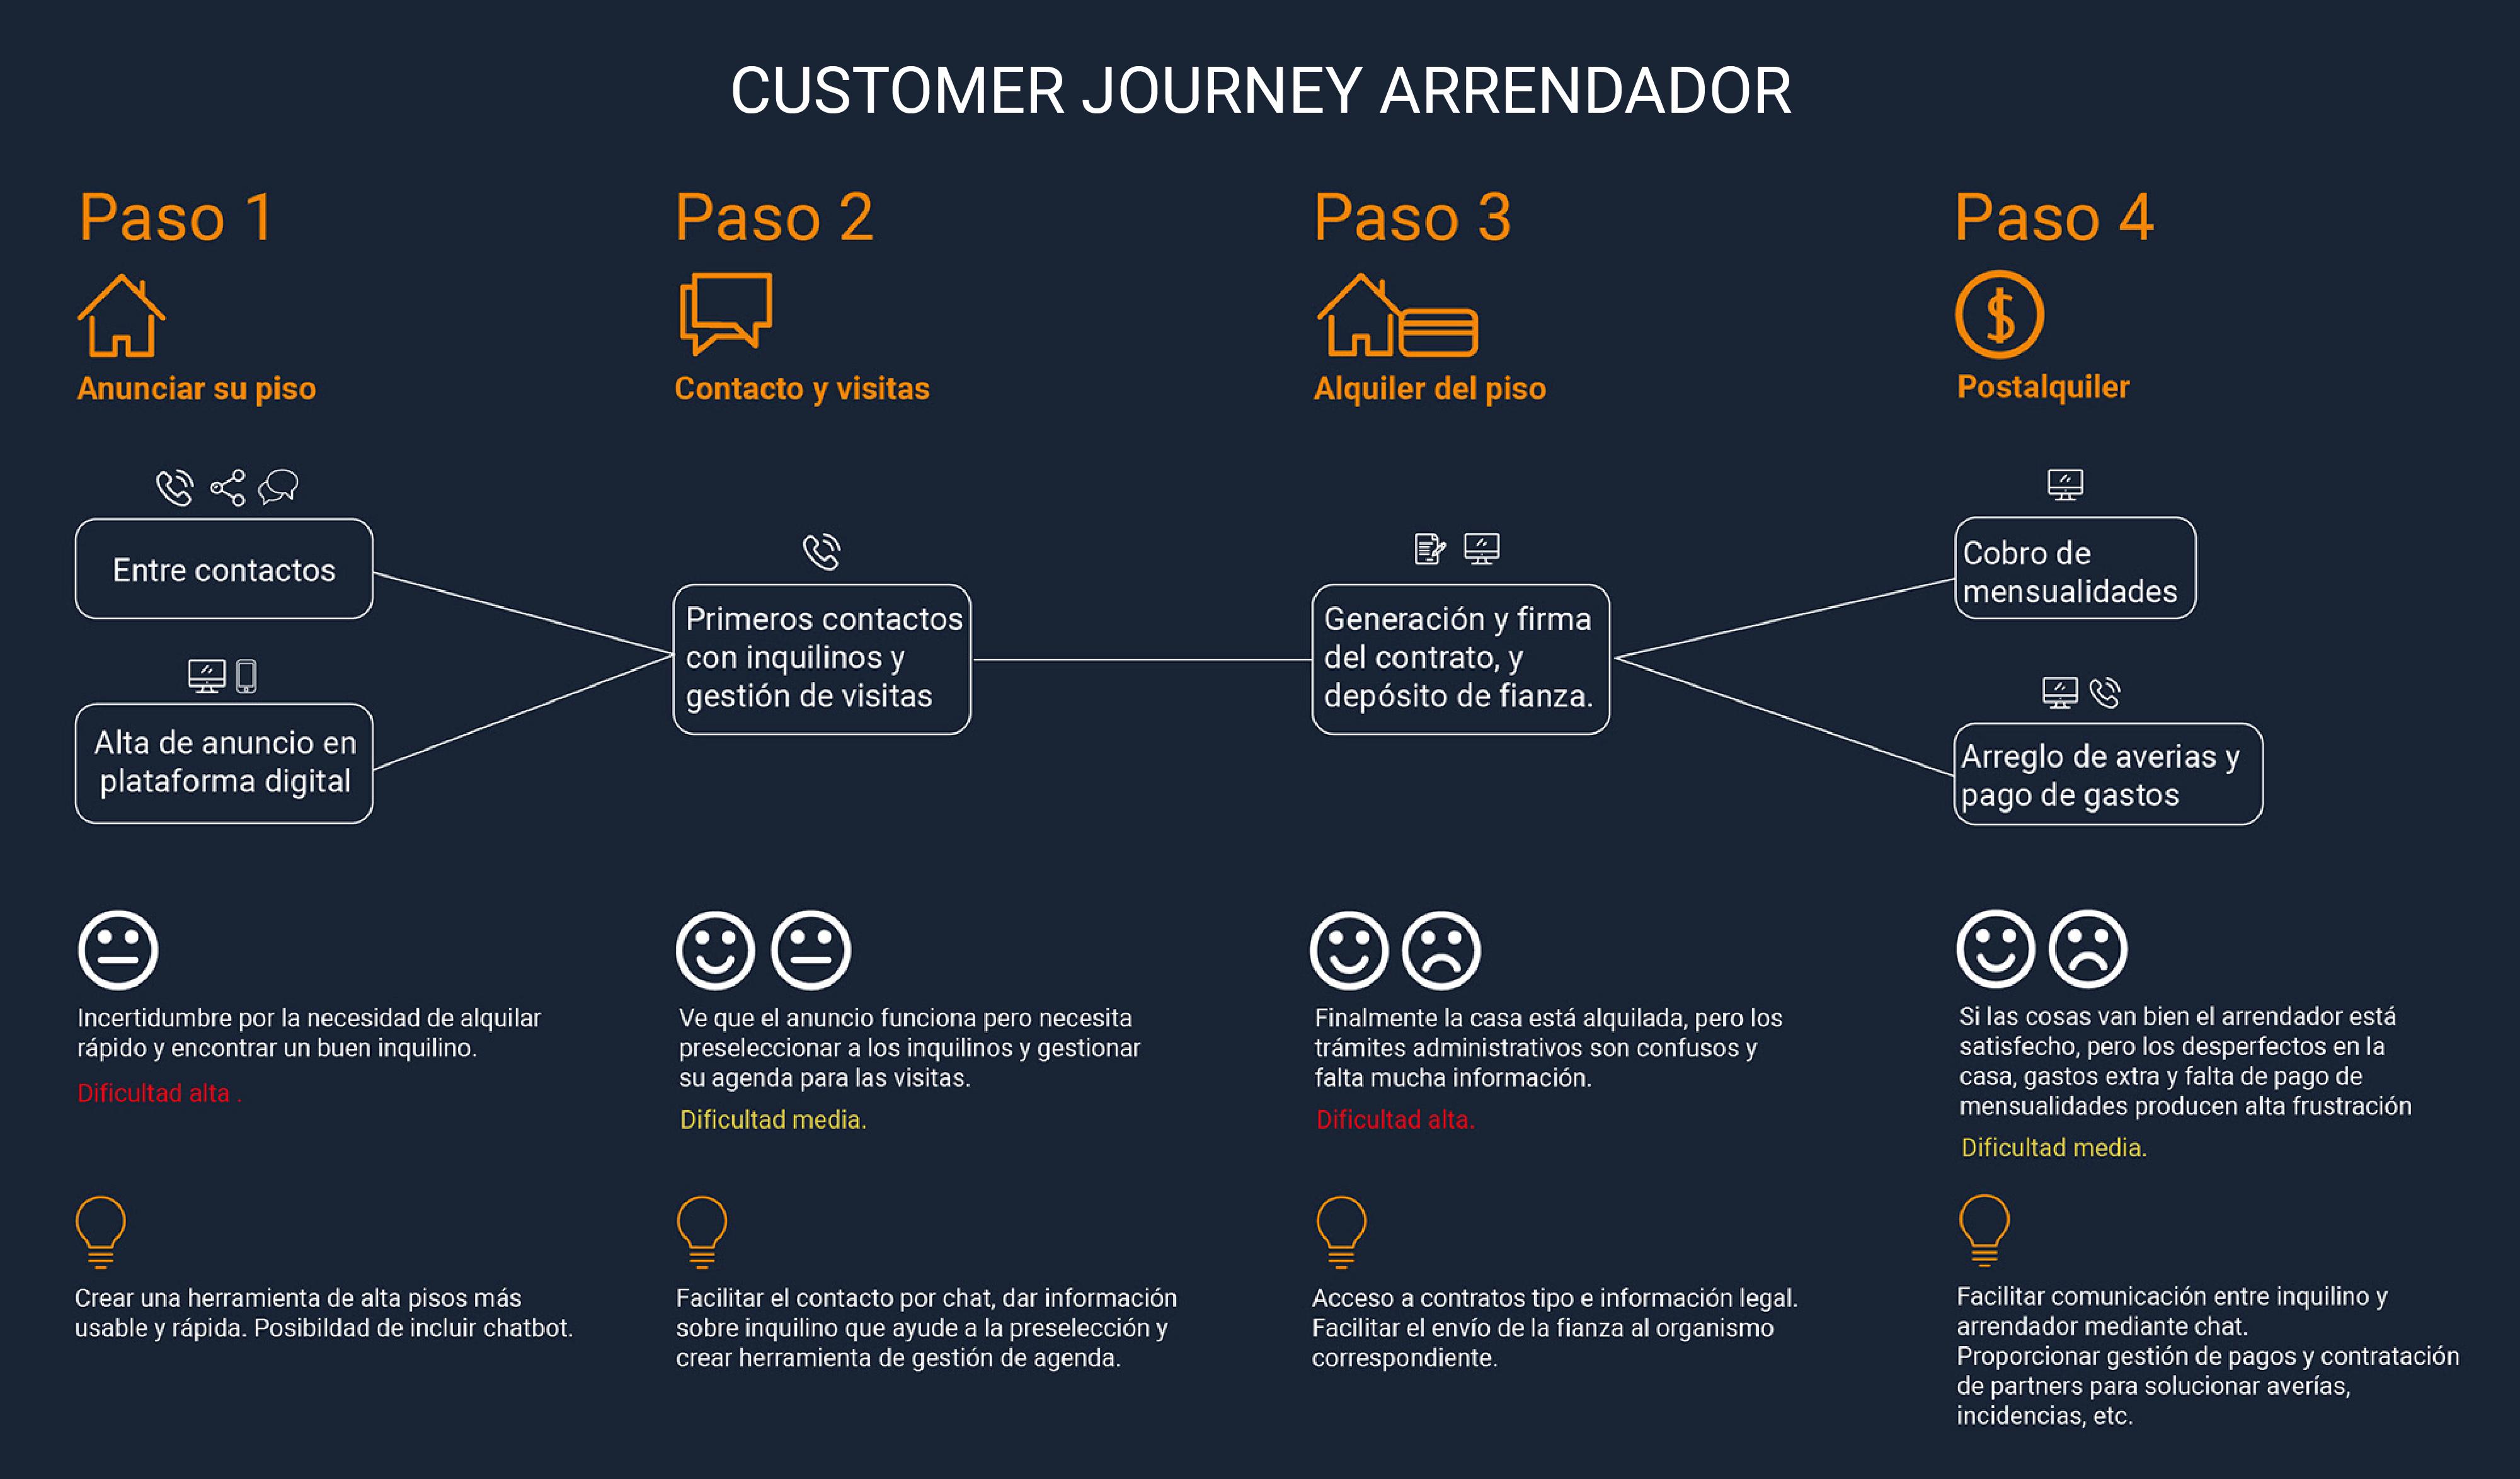 Customer Journey arrendador para app inmobiliaria